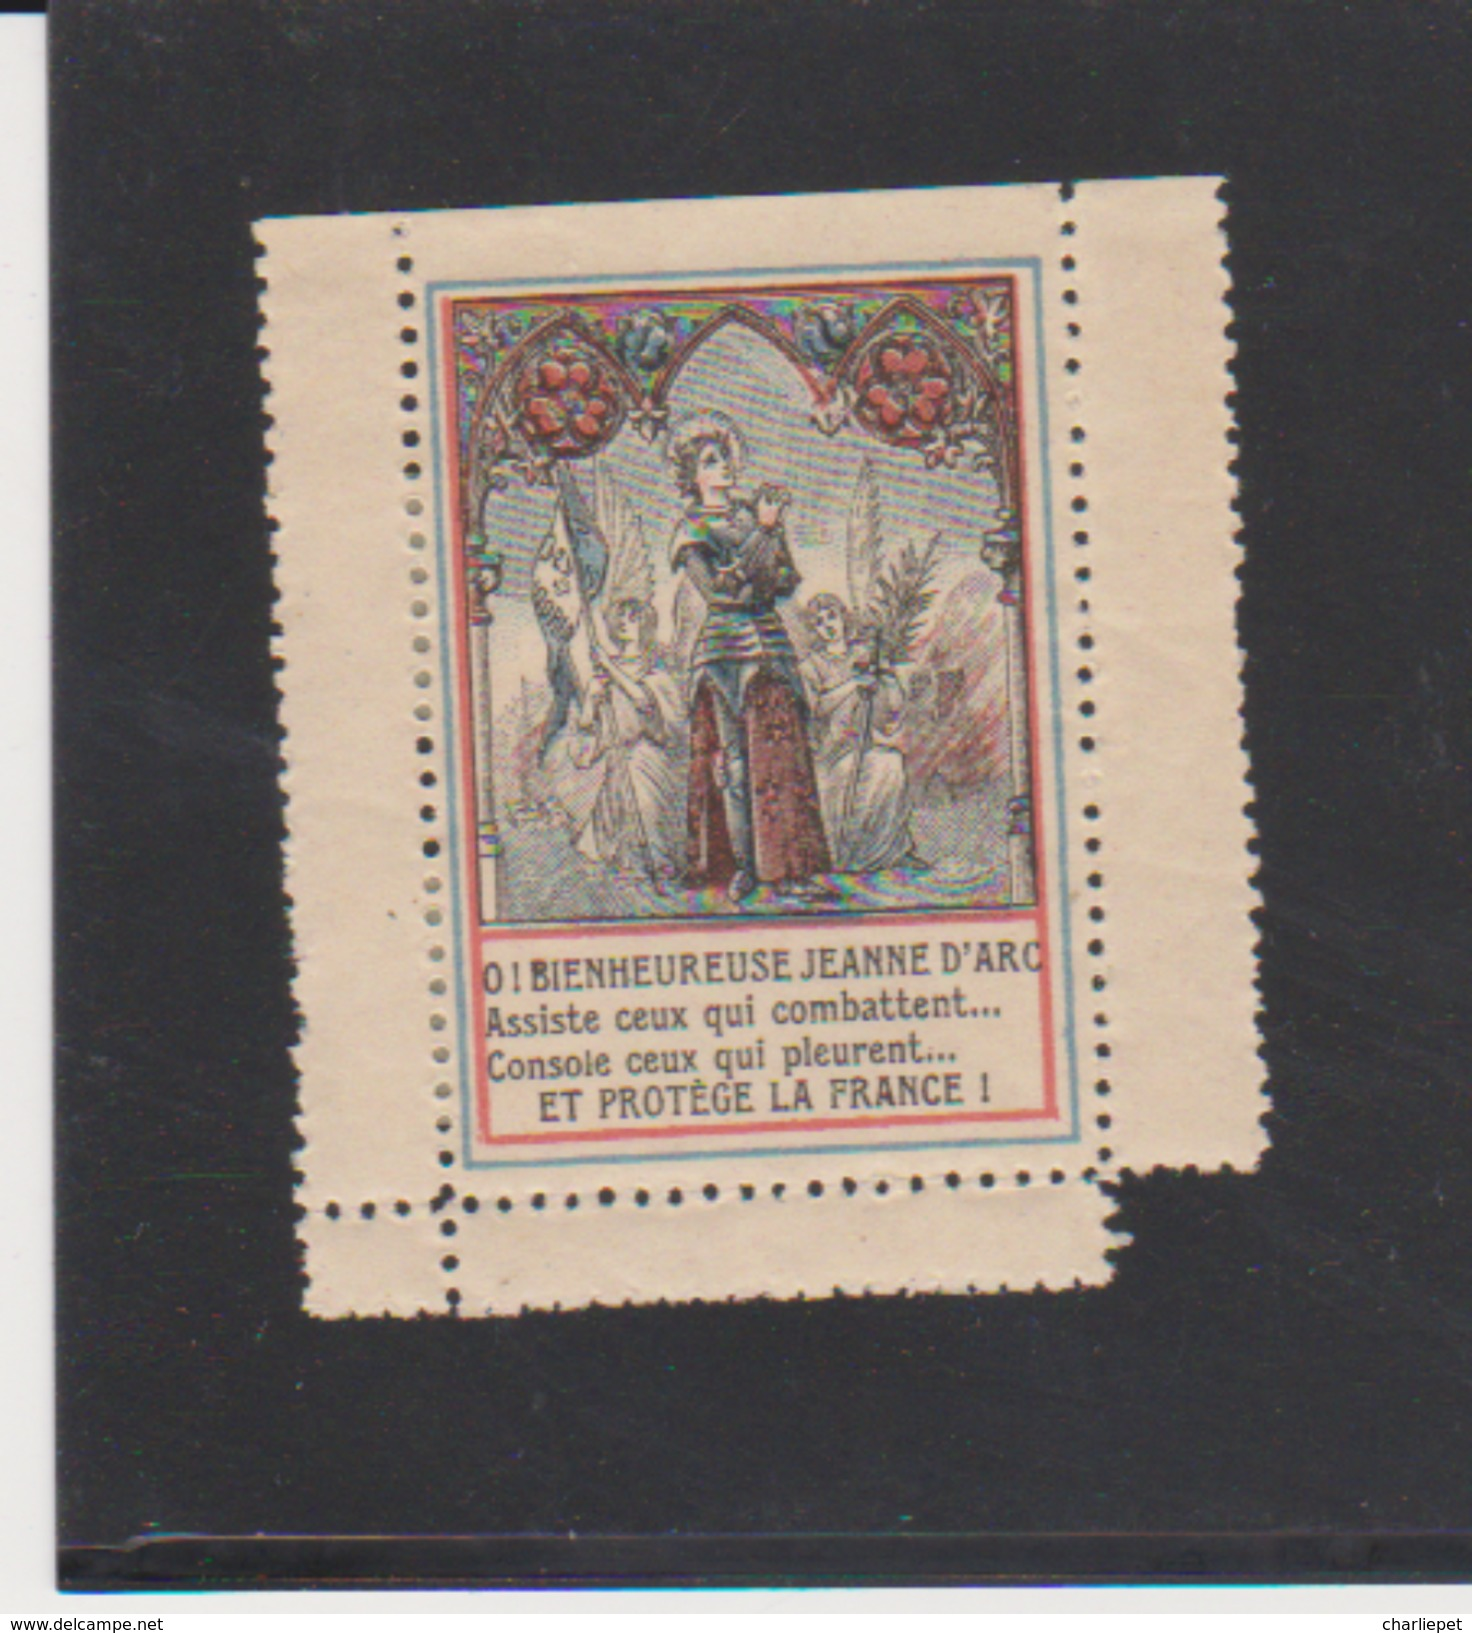 France WWI Jeanne D'Arc Vignette  Military Heritage Collar Perf Poster Stamp - Erinnofilia